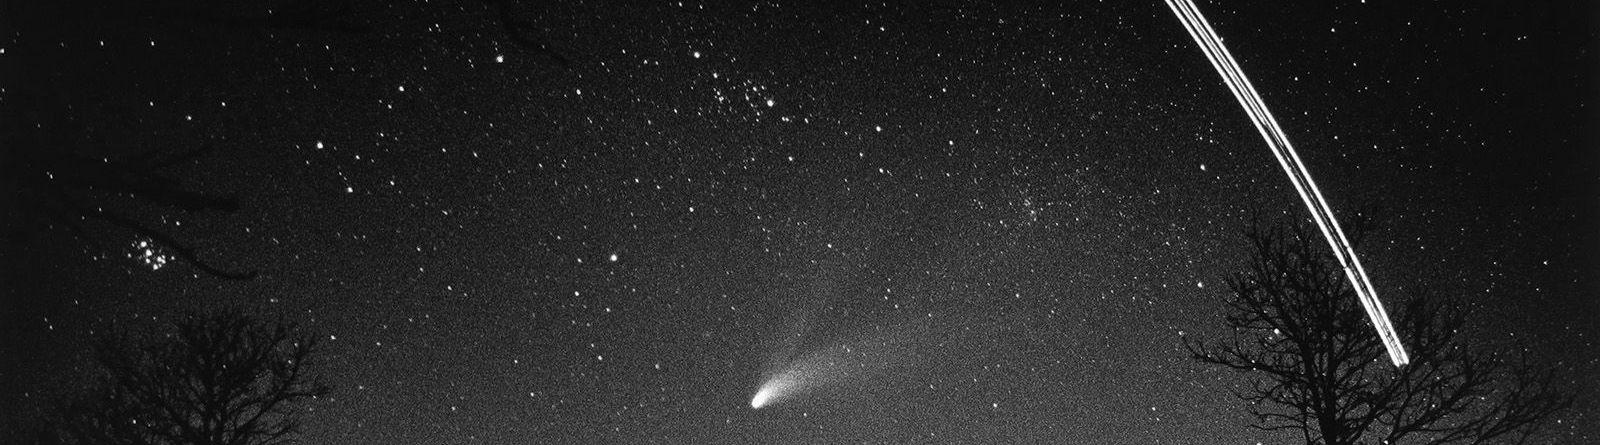 Stephen DiRado, Tisbury Comet Hale Bopp,  Tisbury, MA, 1997.